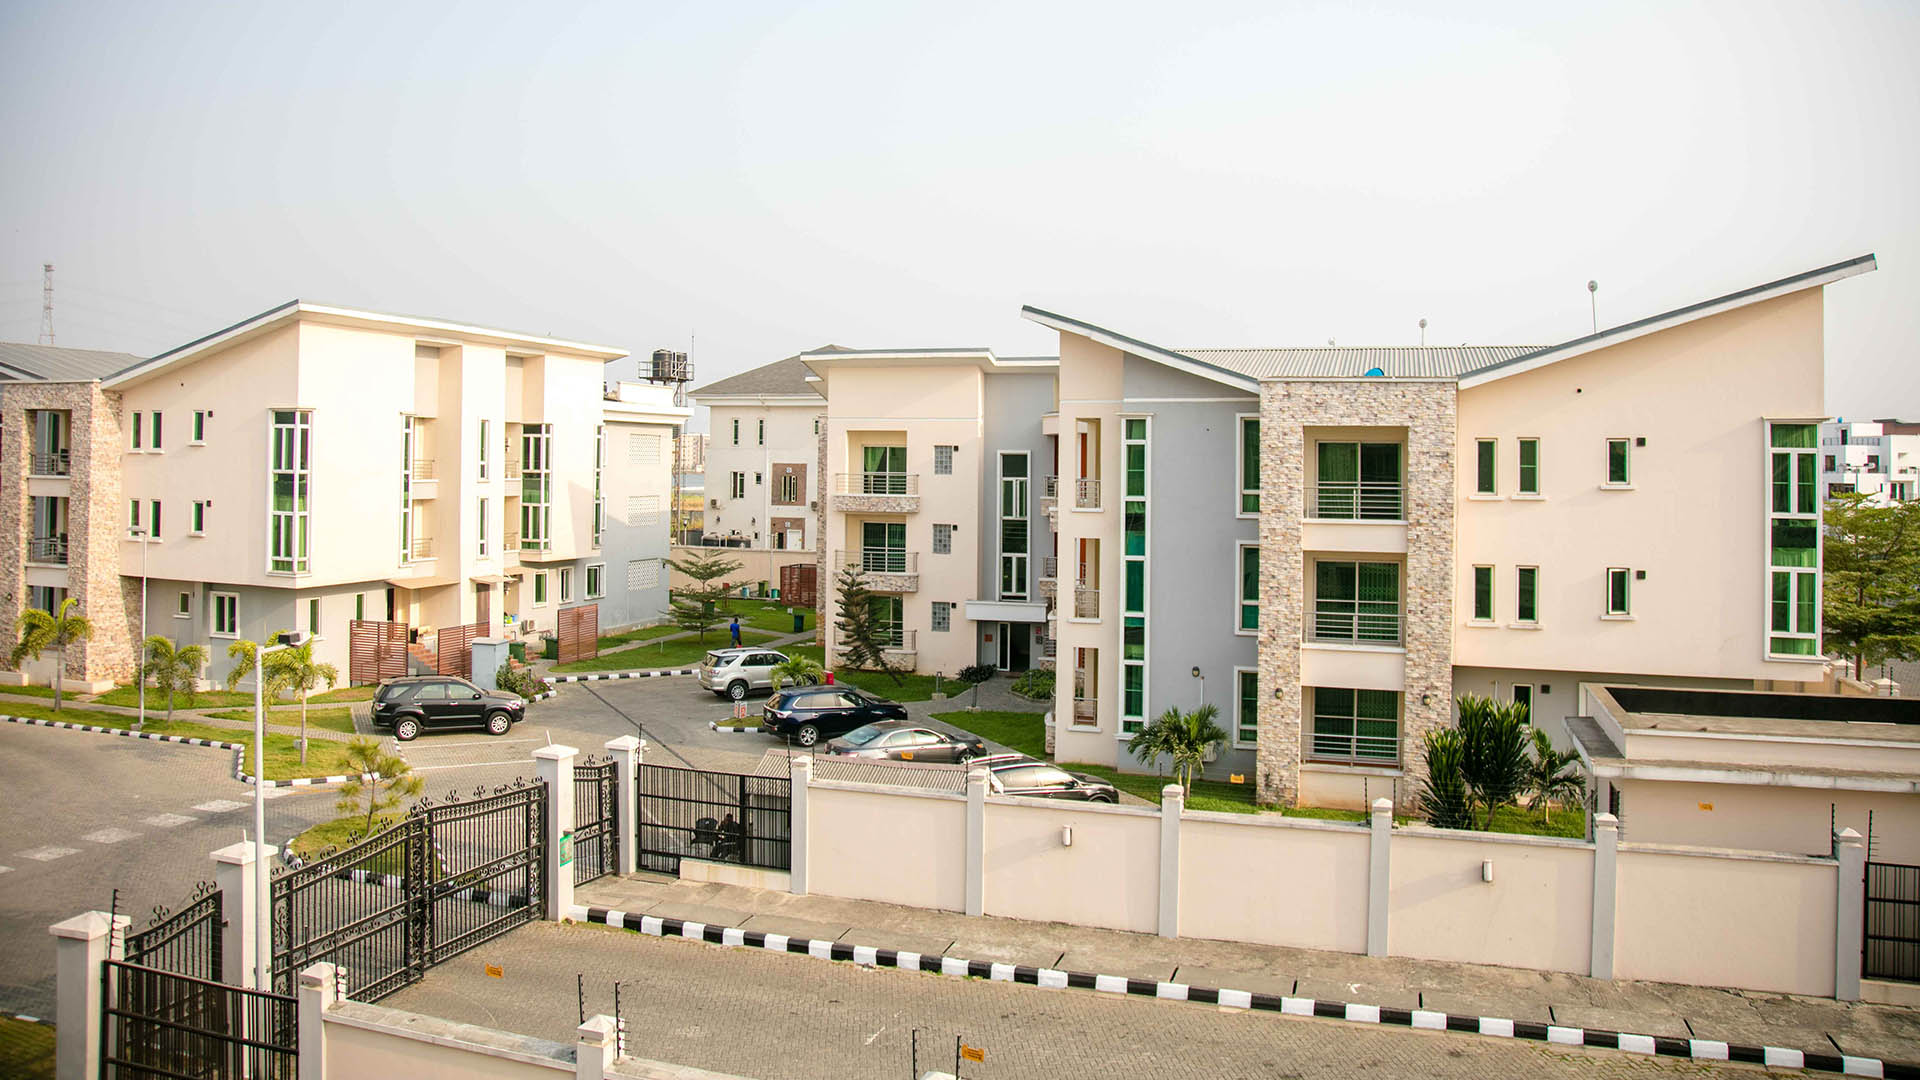 LAMB'S COURT BANANA ISLAND LAGOS NIGERIA